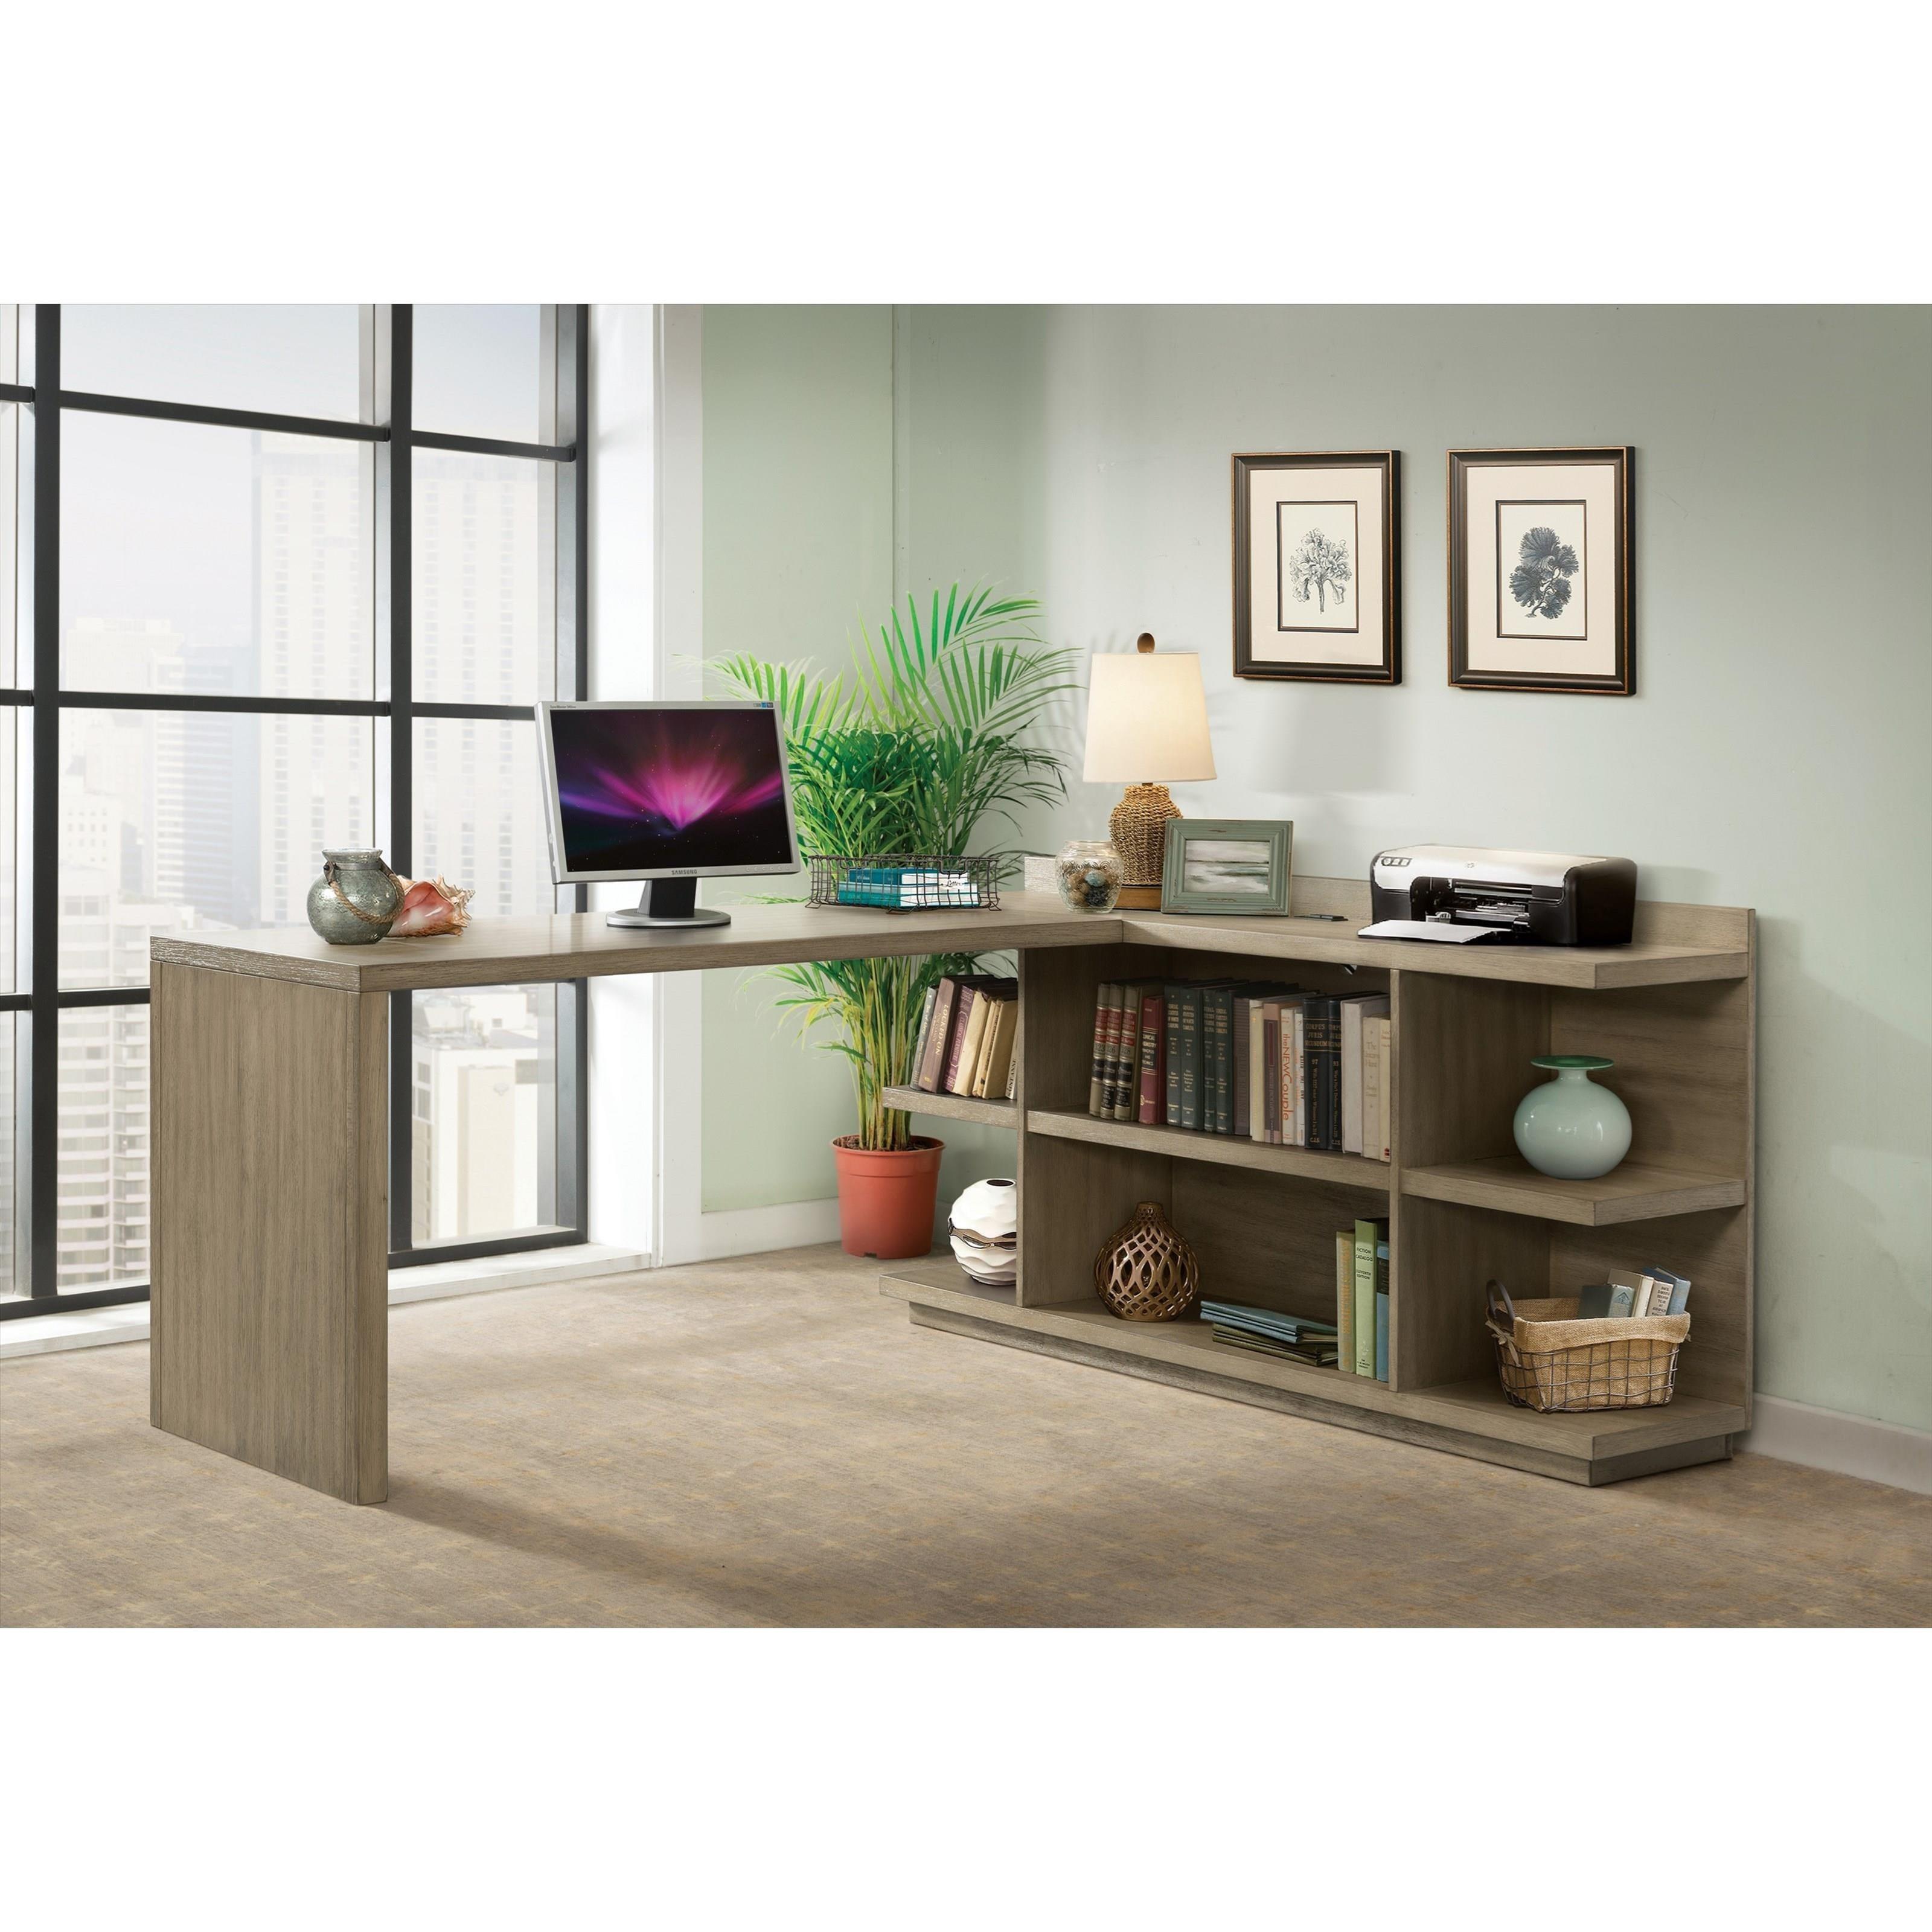 ... Riverside Furniture PerspectivesPeninsula Bookcase Desk ...